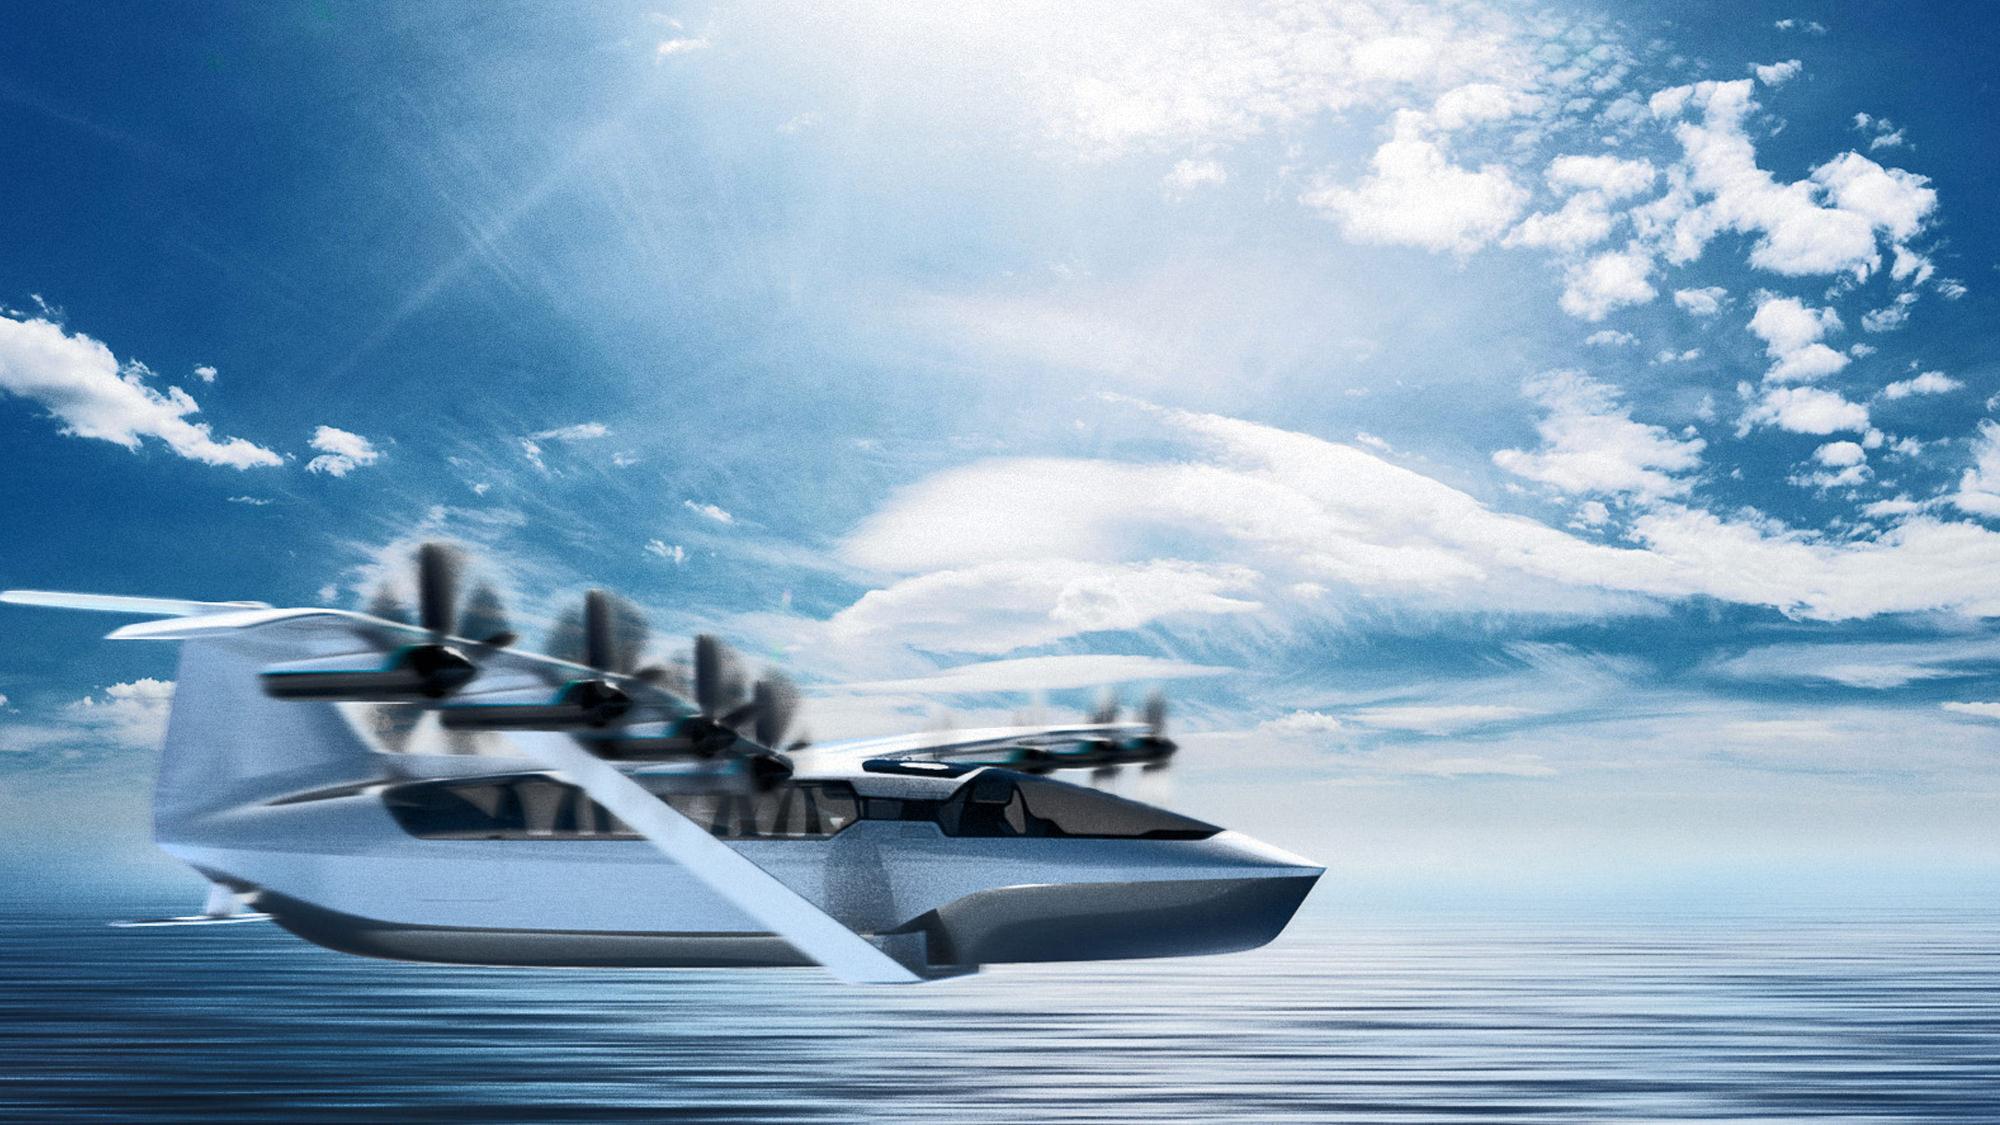 Regent Seaglider flying over water